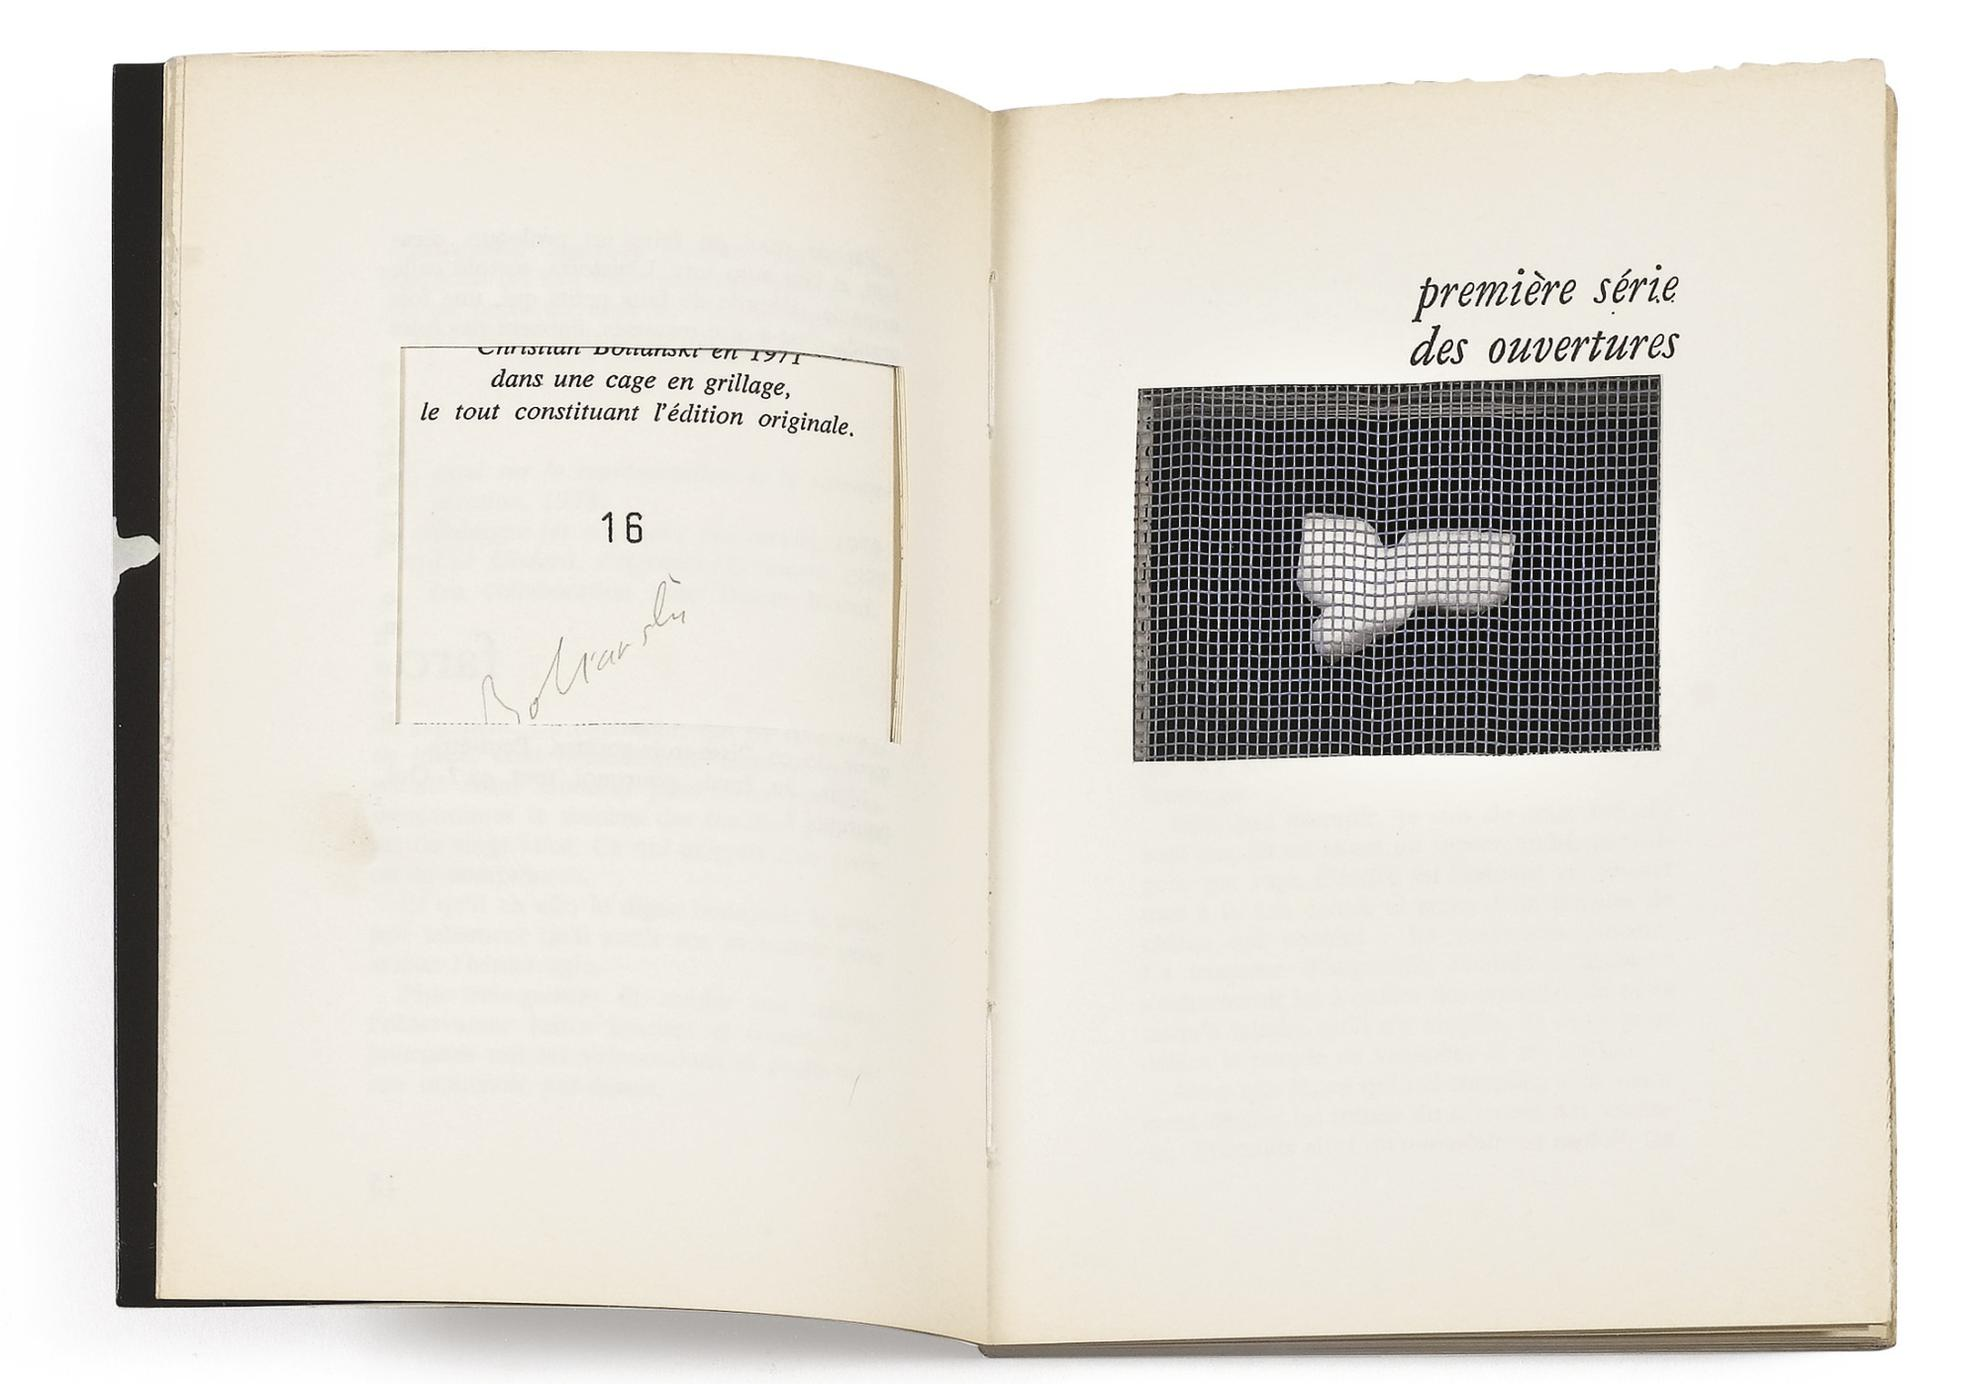 Christian Boltanski Et Jean-Marie Touratier - Farce. Paris, Galilee-1979